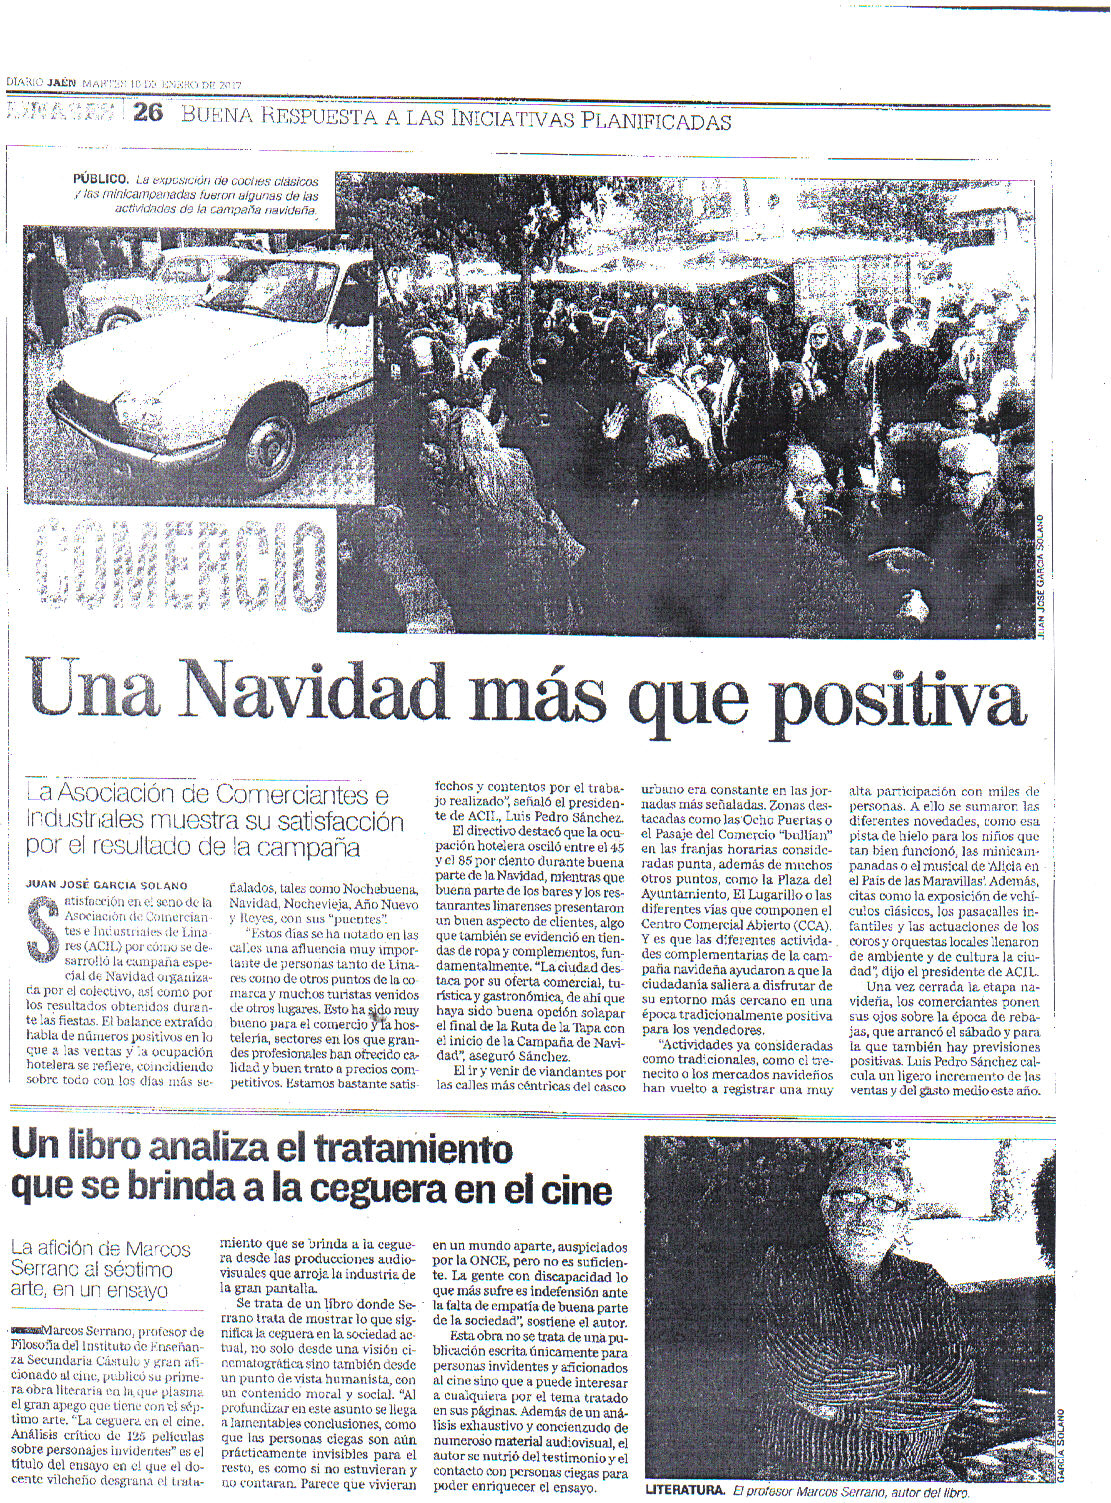 Prensa 10 de enero. Diario Jaen